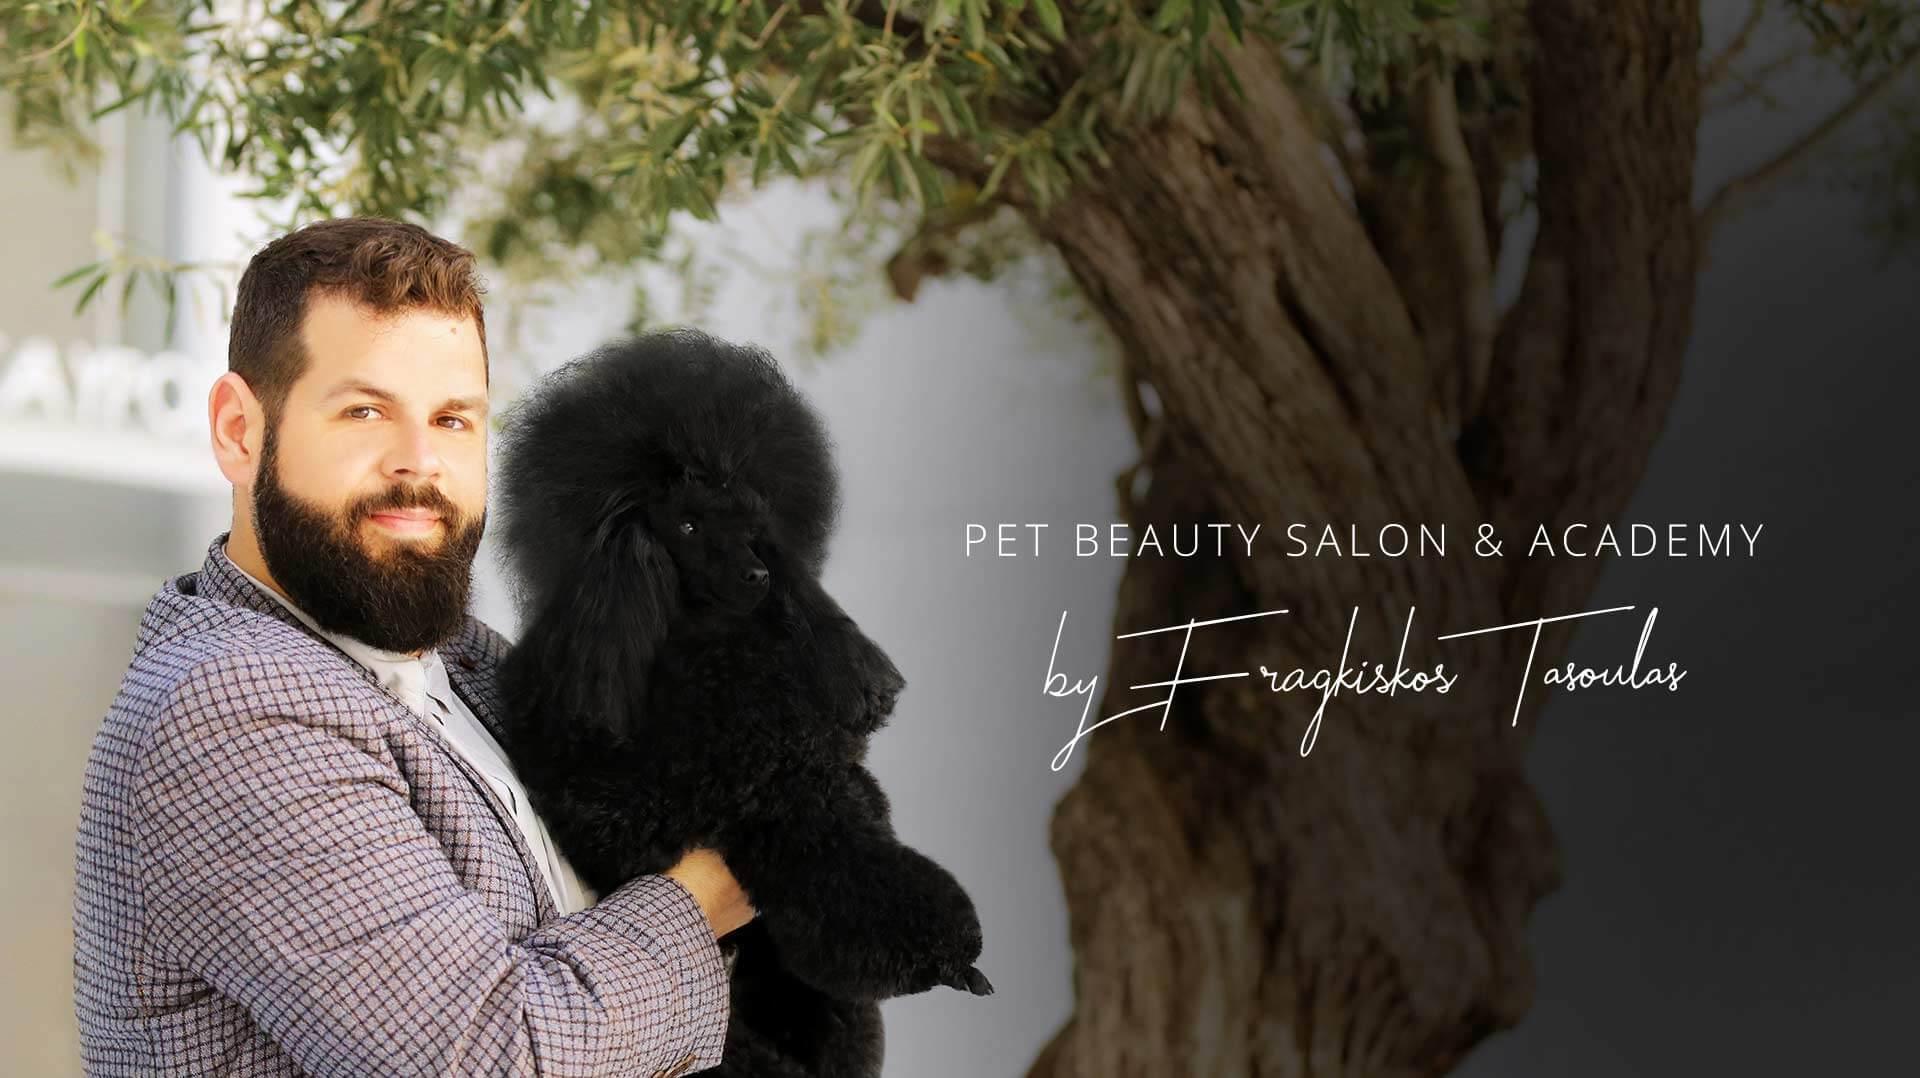 Pet Beauty Salon, Κομμωτήριο σκύλων στην Αθήνα, Σχολή Pet Grooming, Σχολή κομμωτικής σκύλων, μαθήματα pet grooming, pet grooming athens